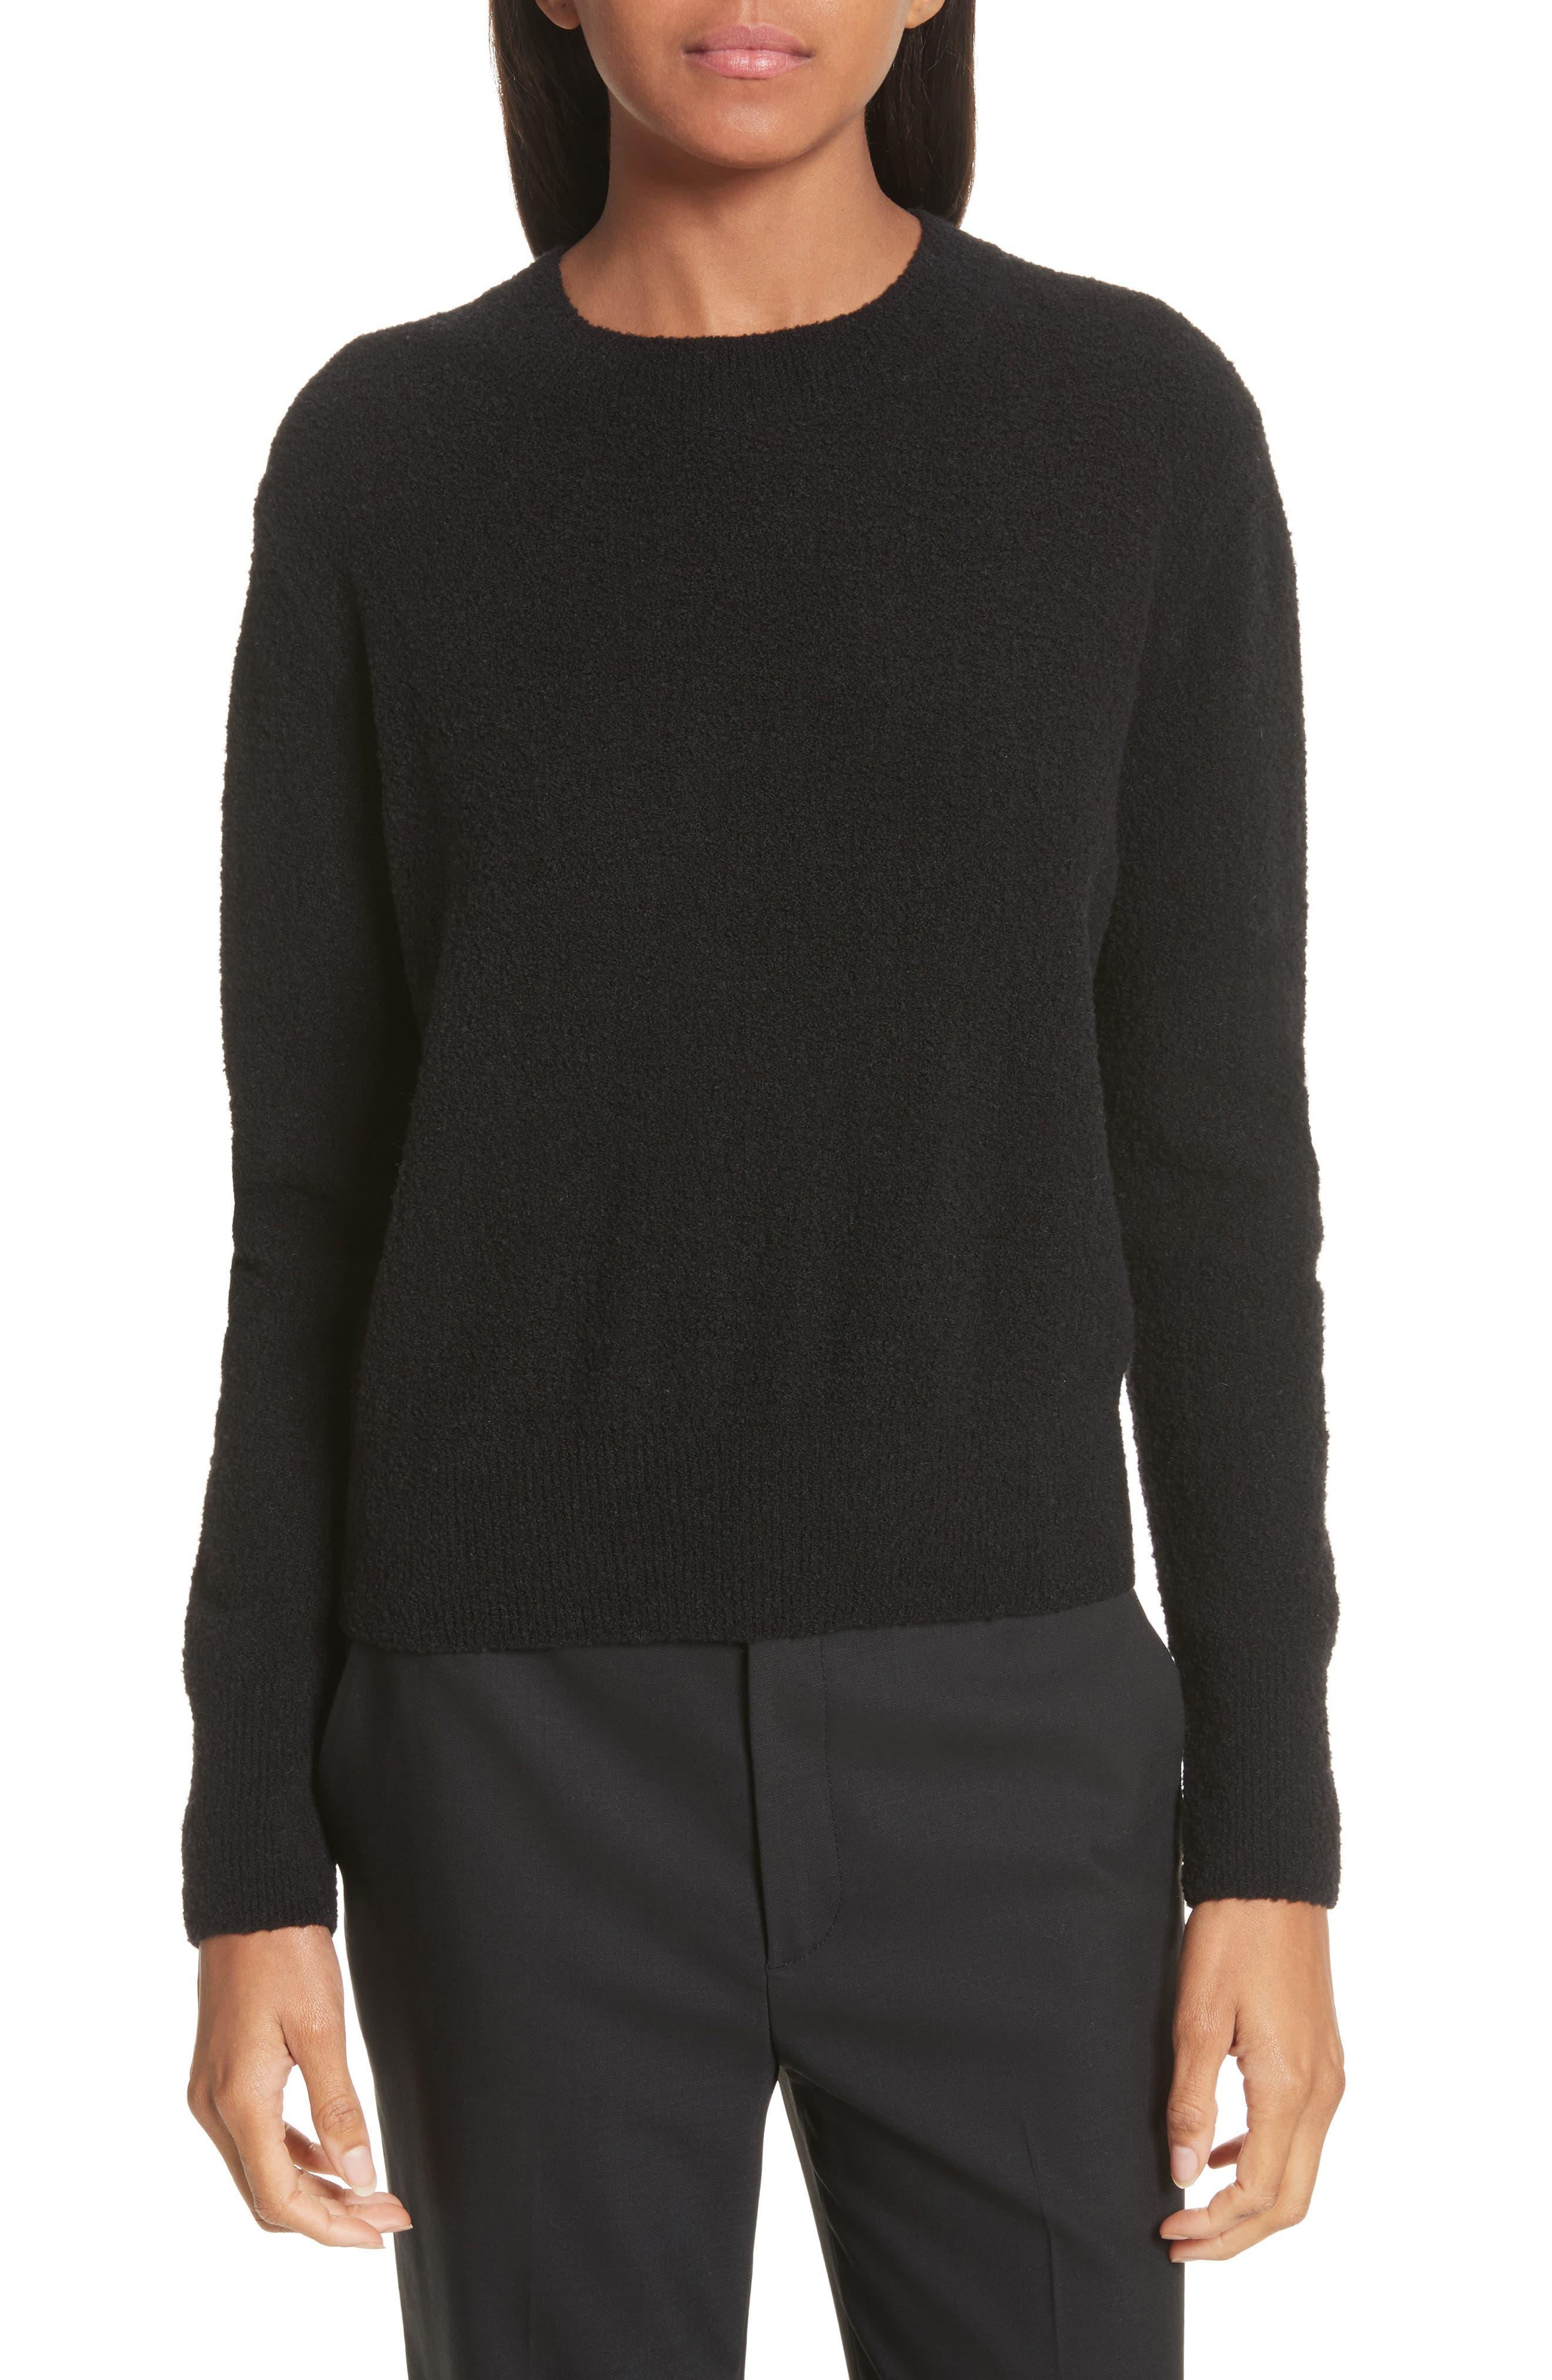 Vince Crewneck Wool Blend Sweater